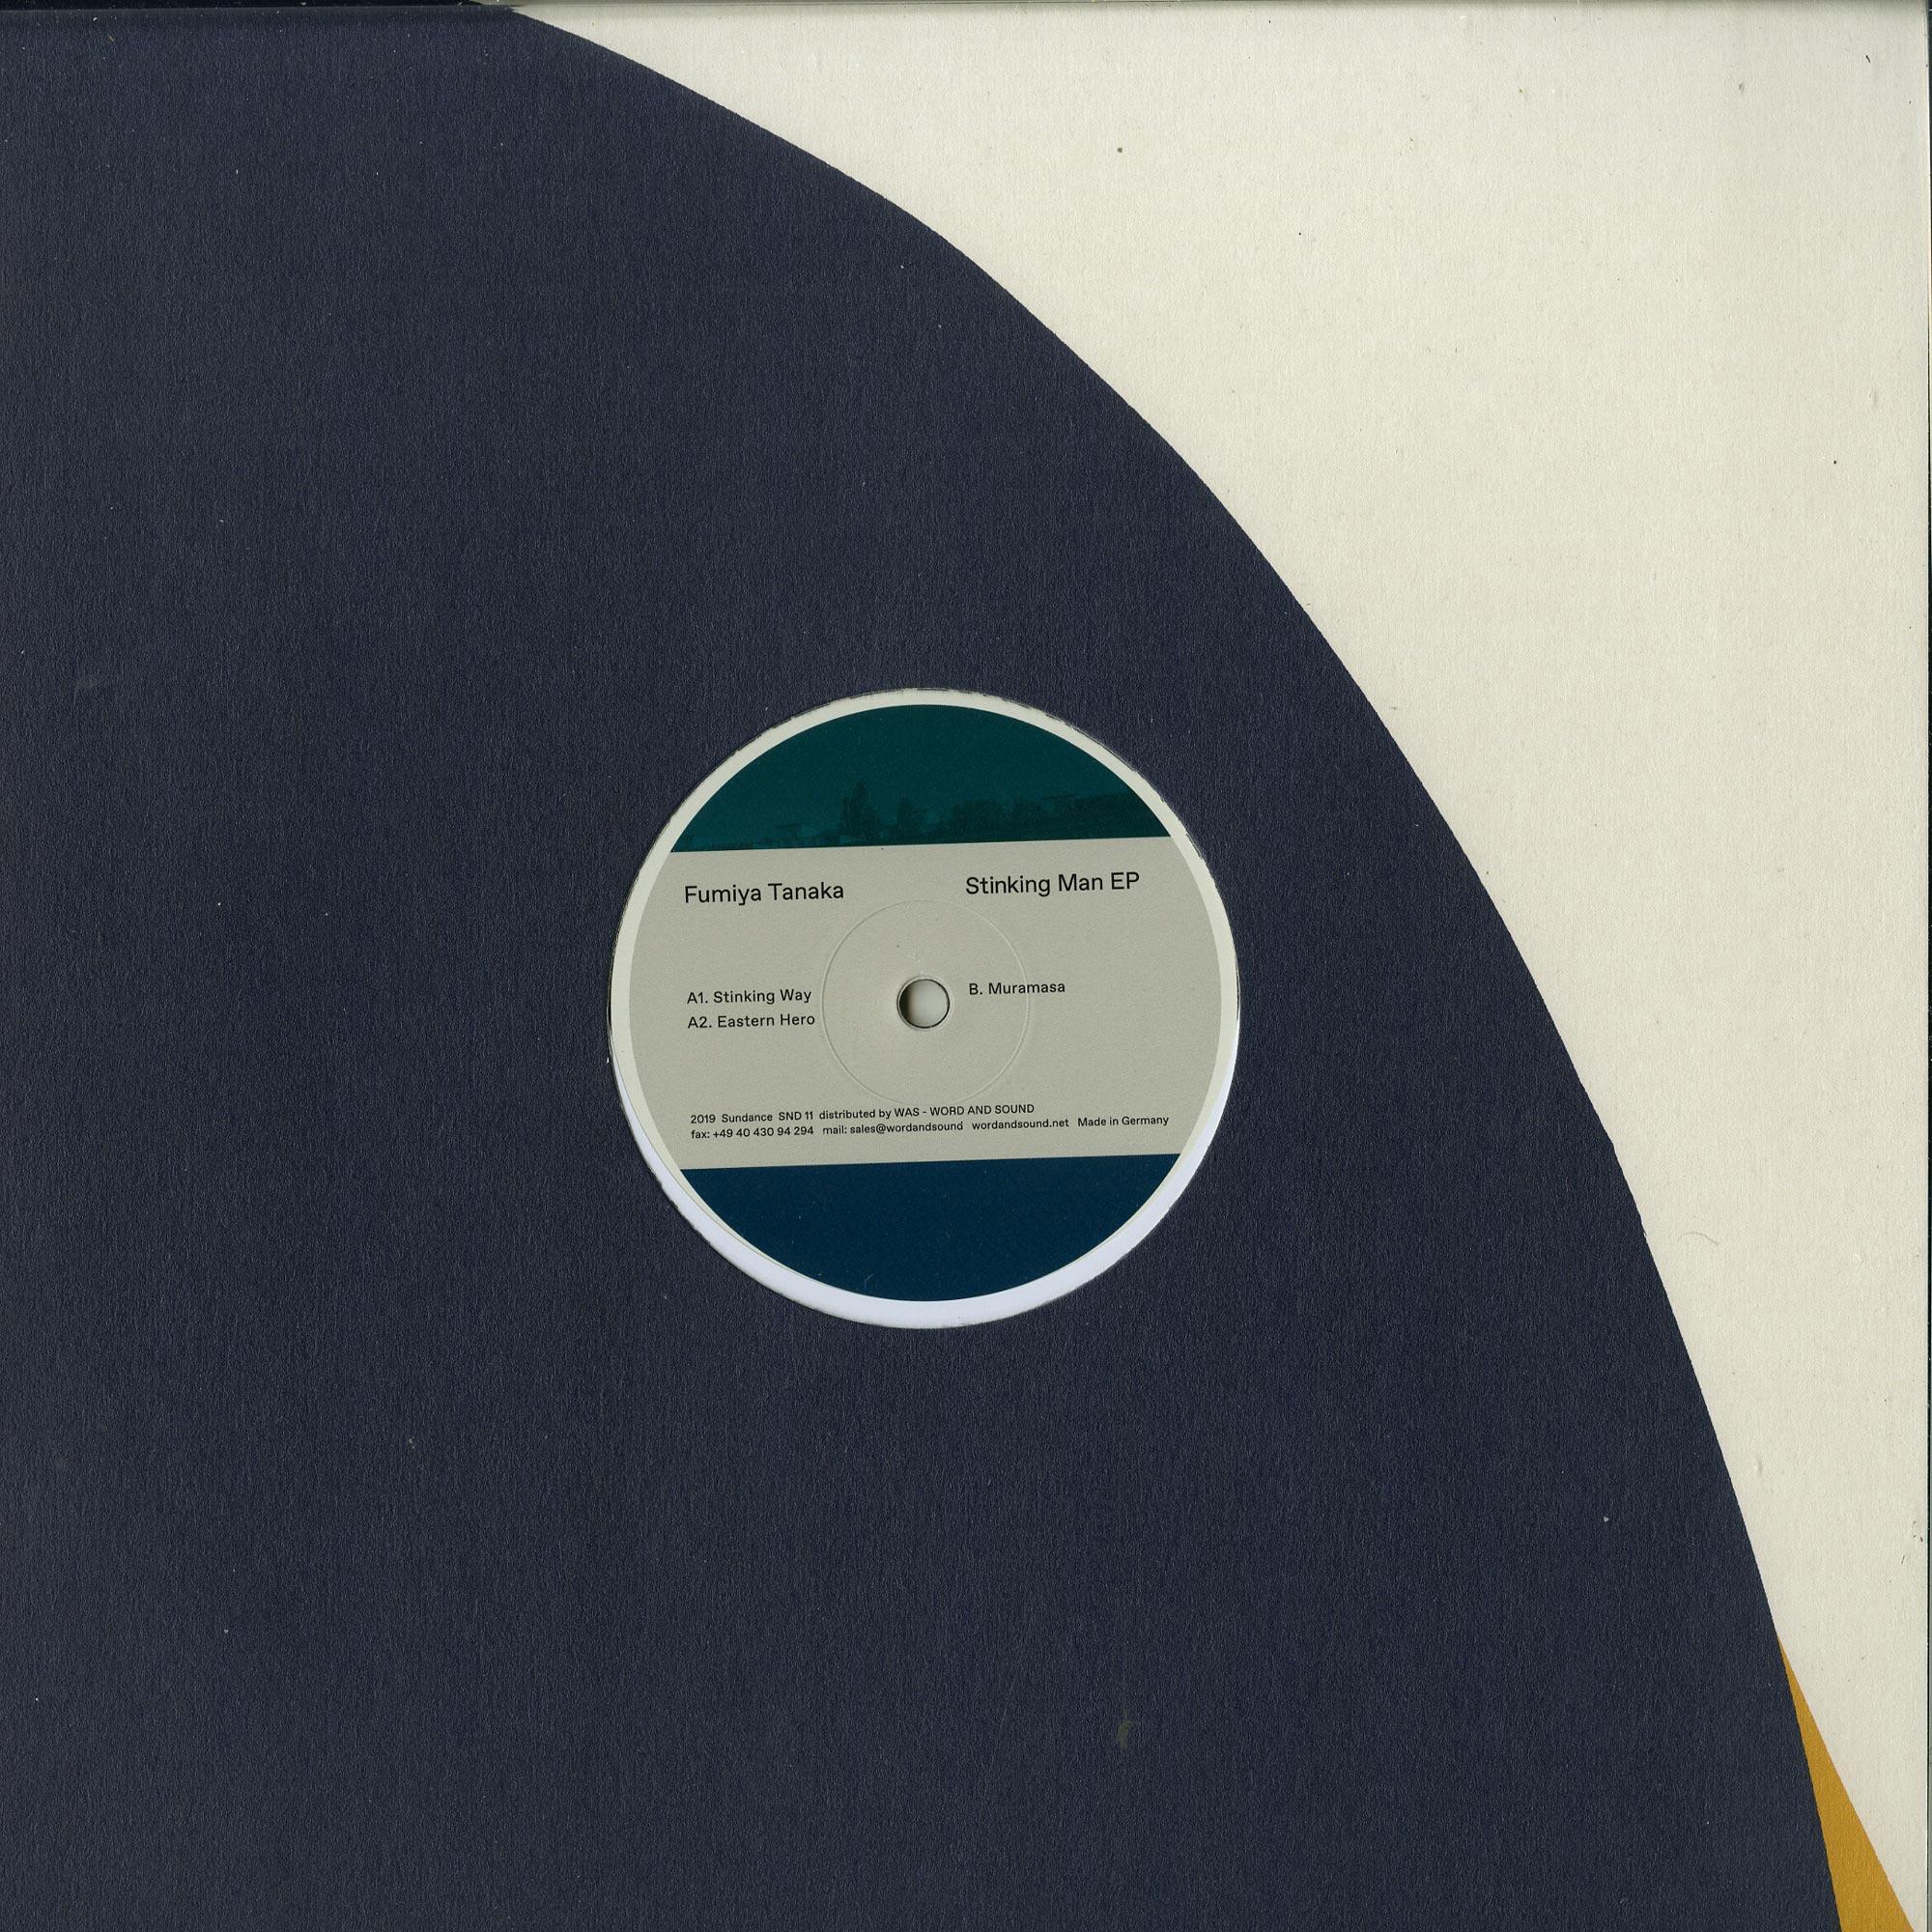 Fumiya Tanaka - STINKING MAN EP